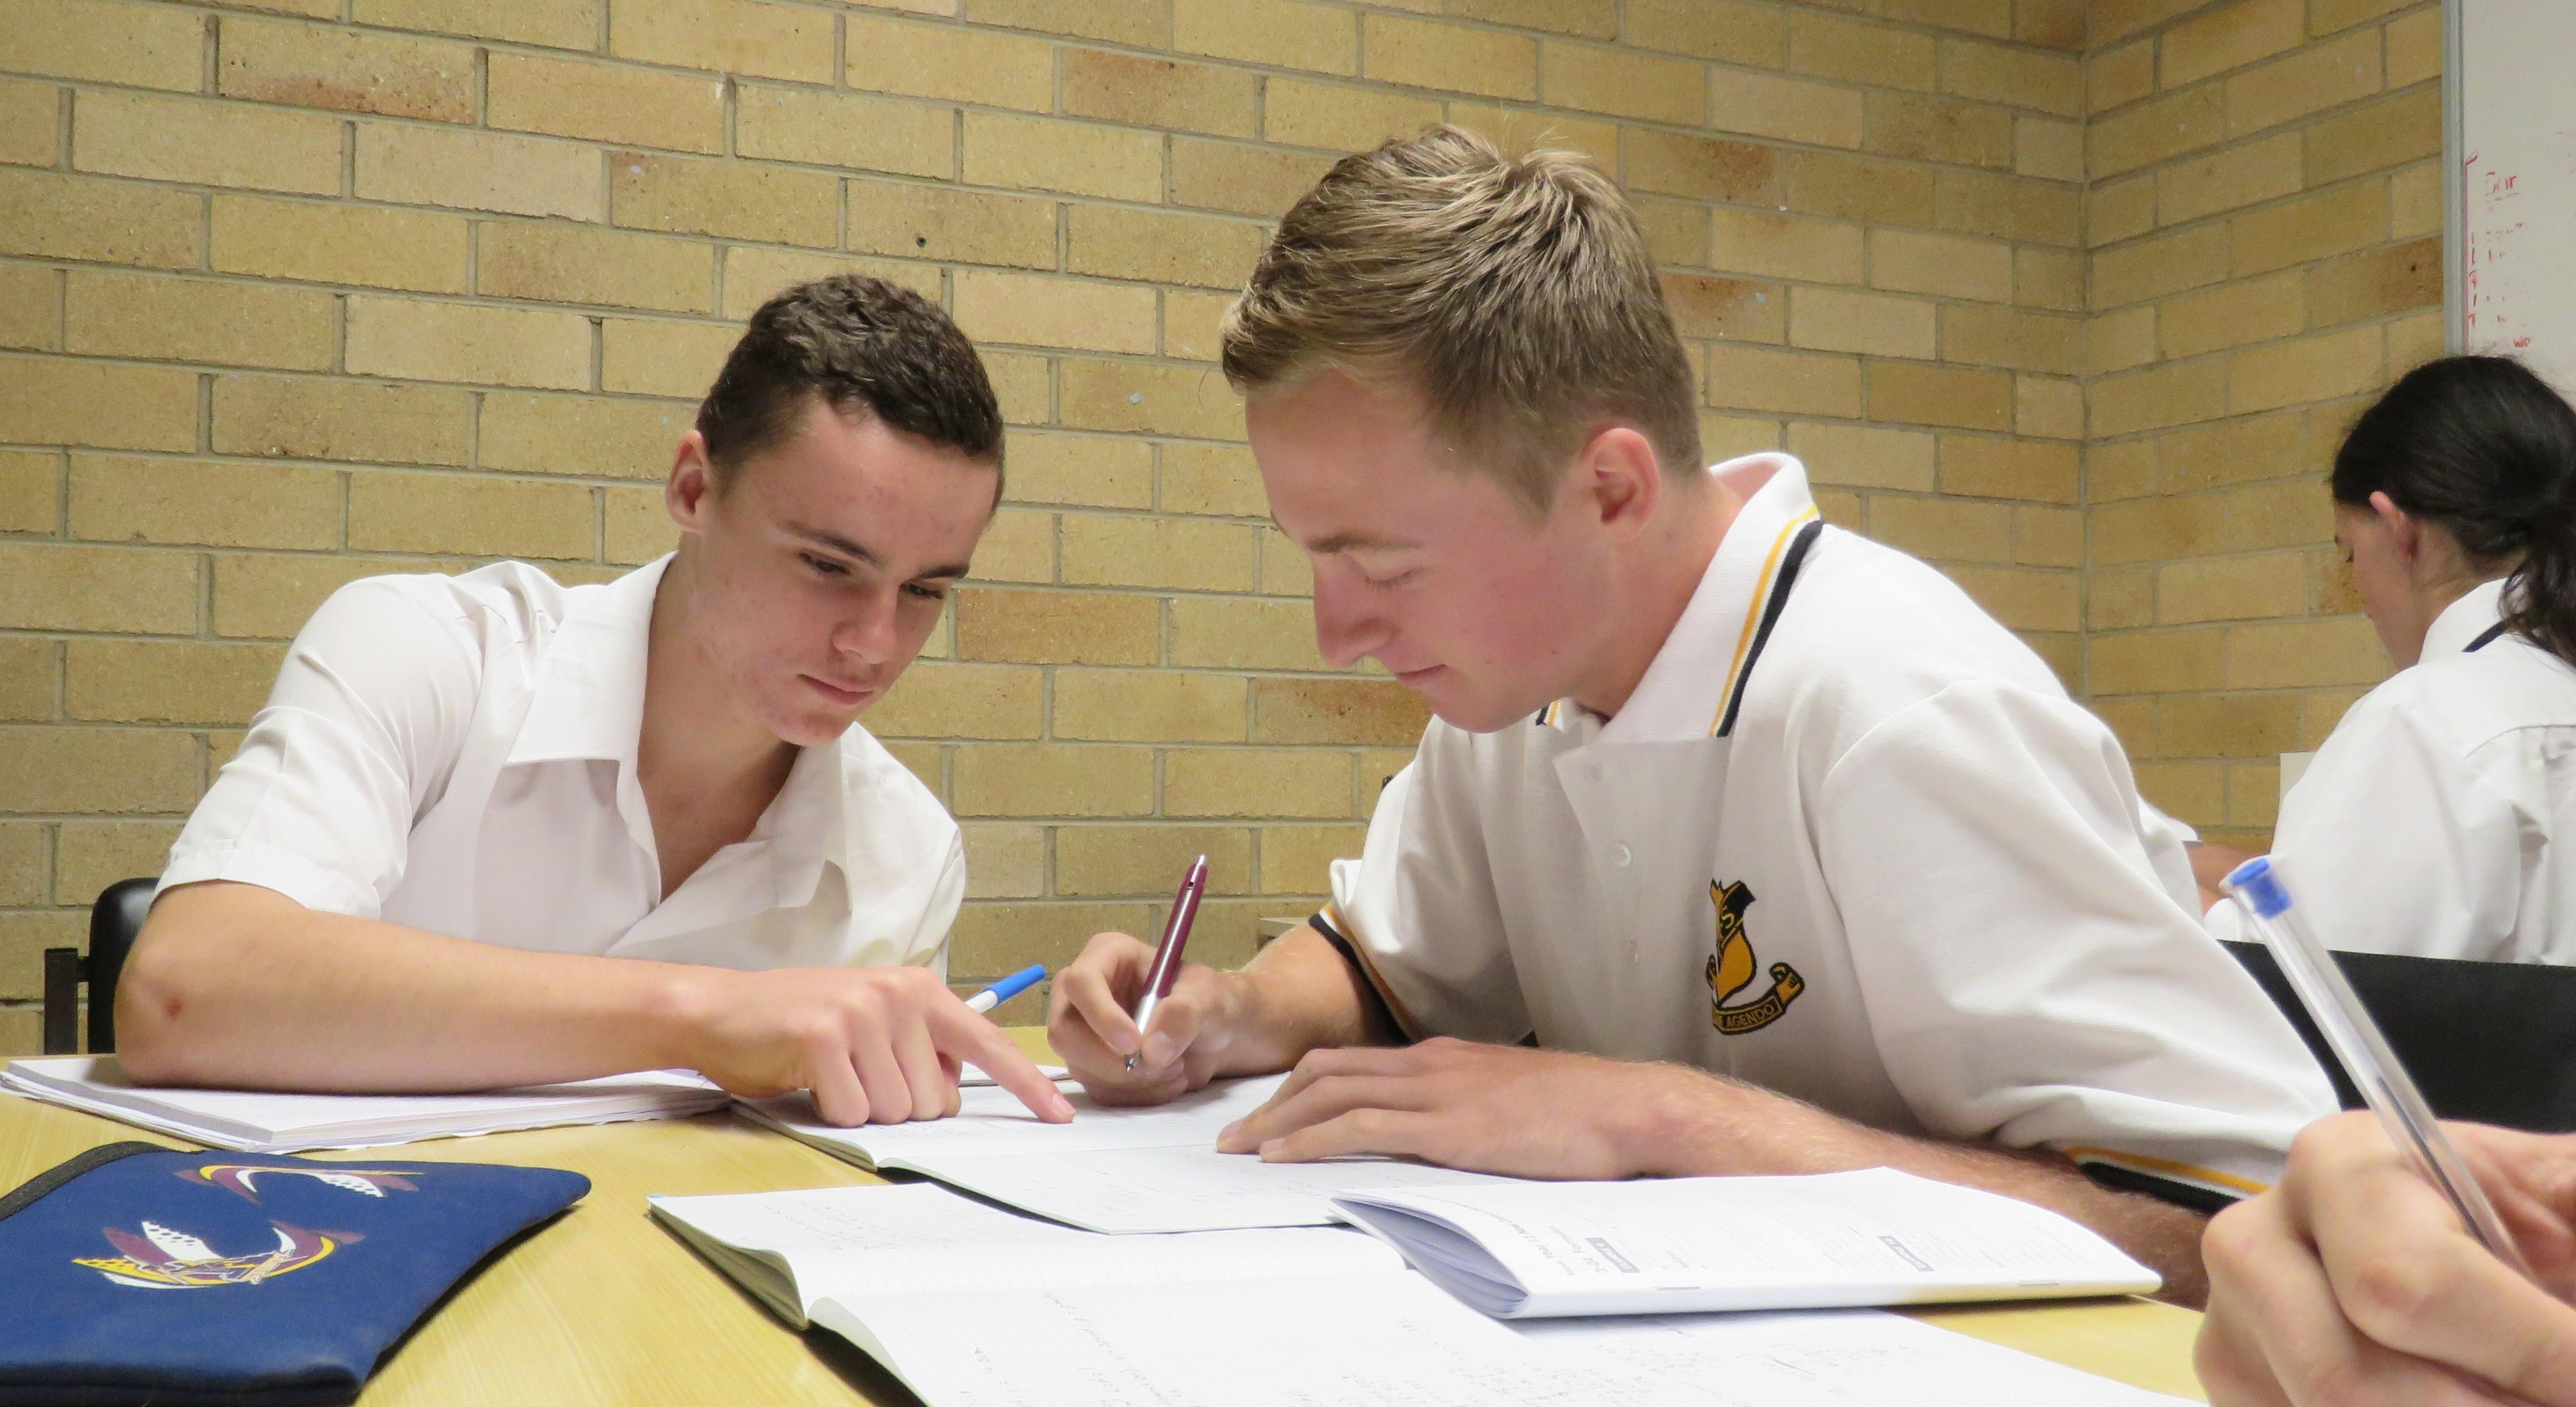 Targeting individual learning